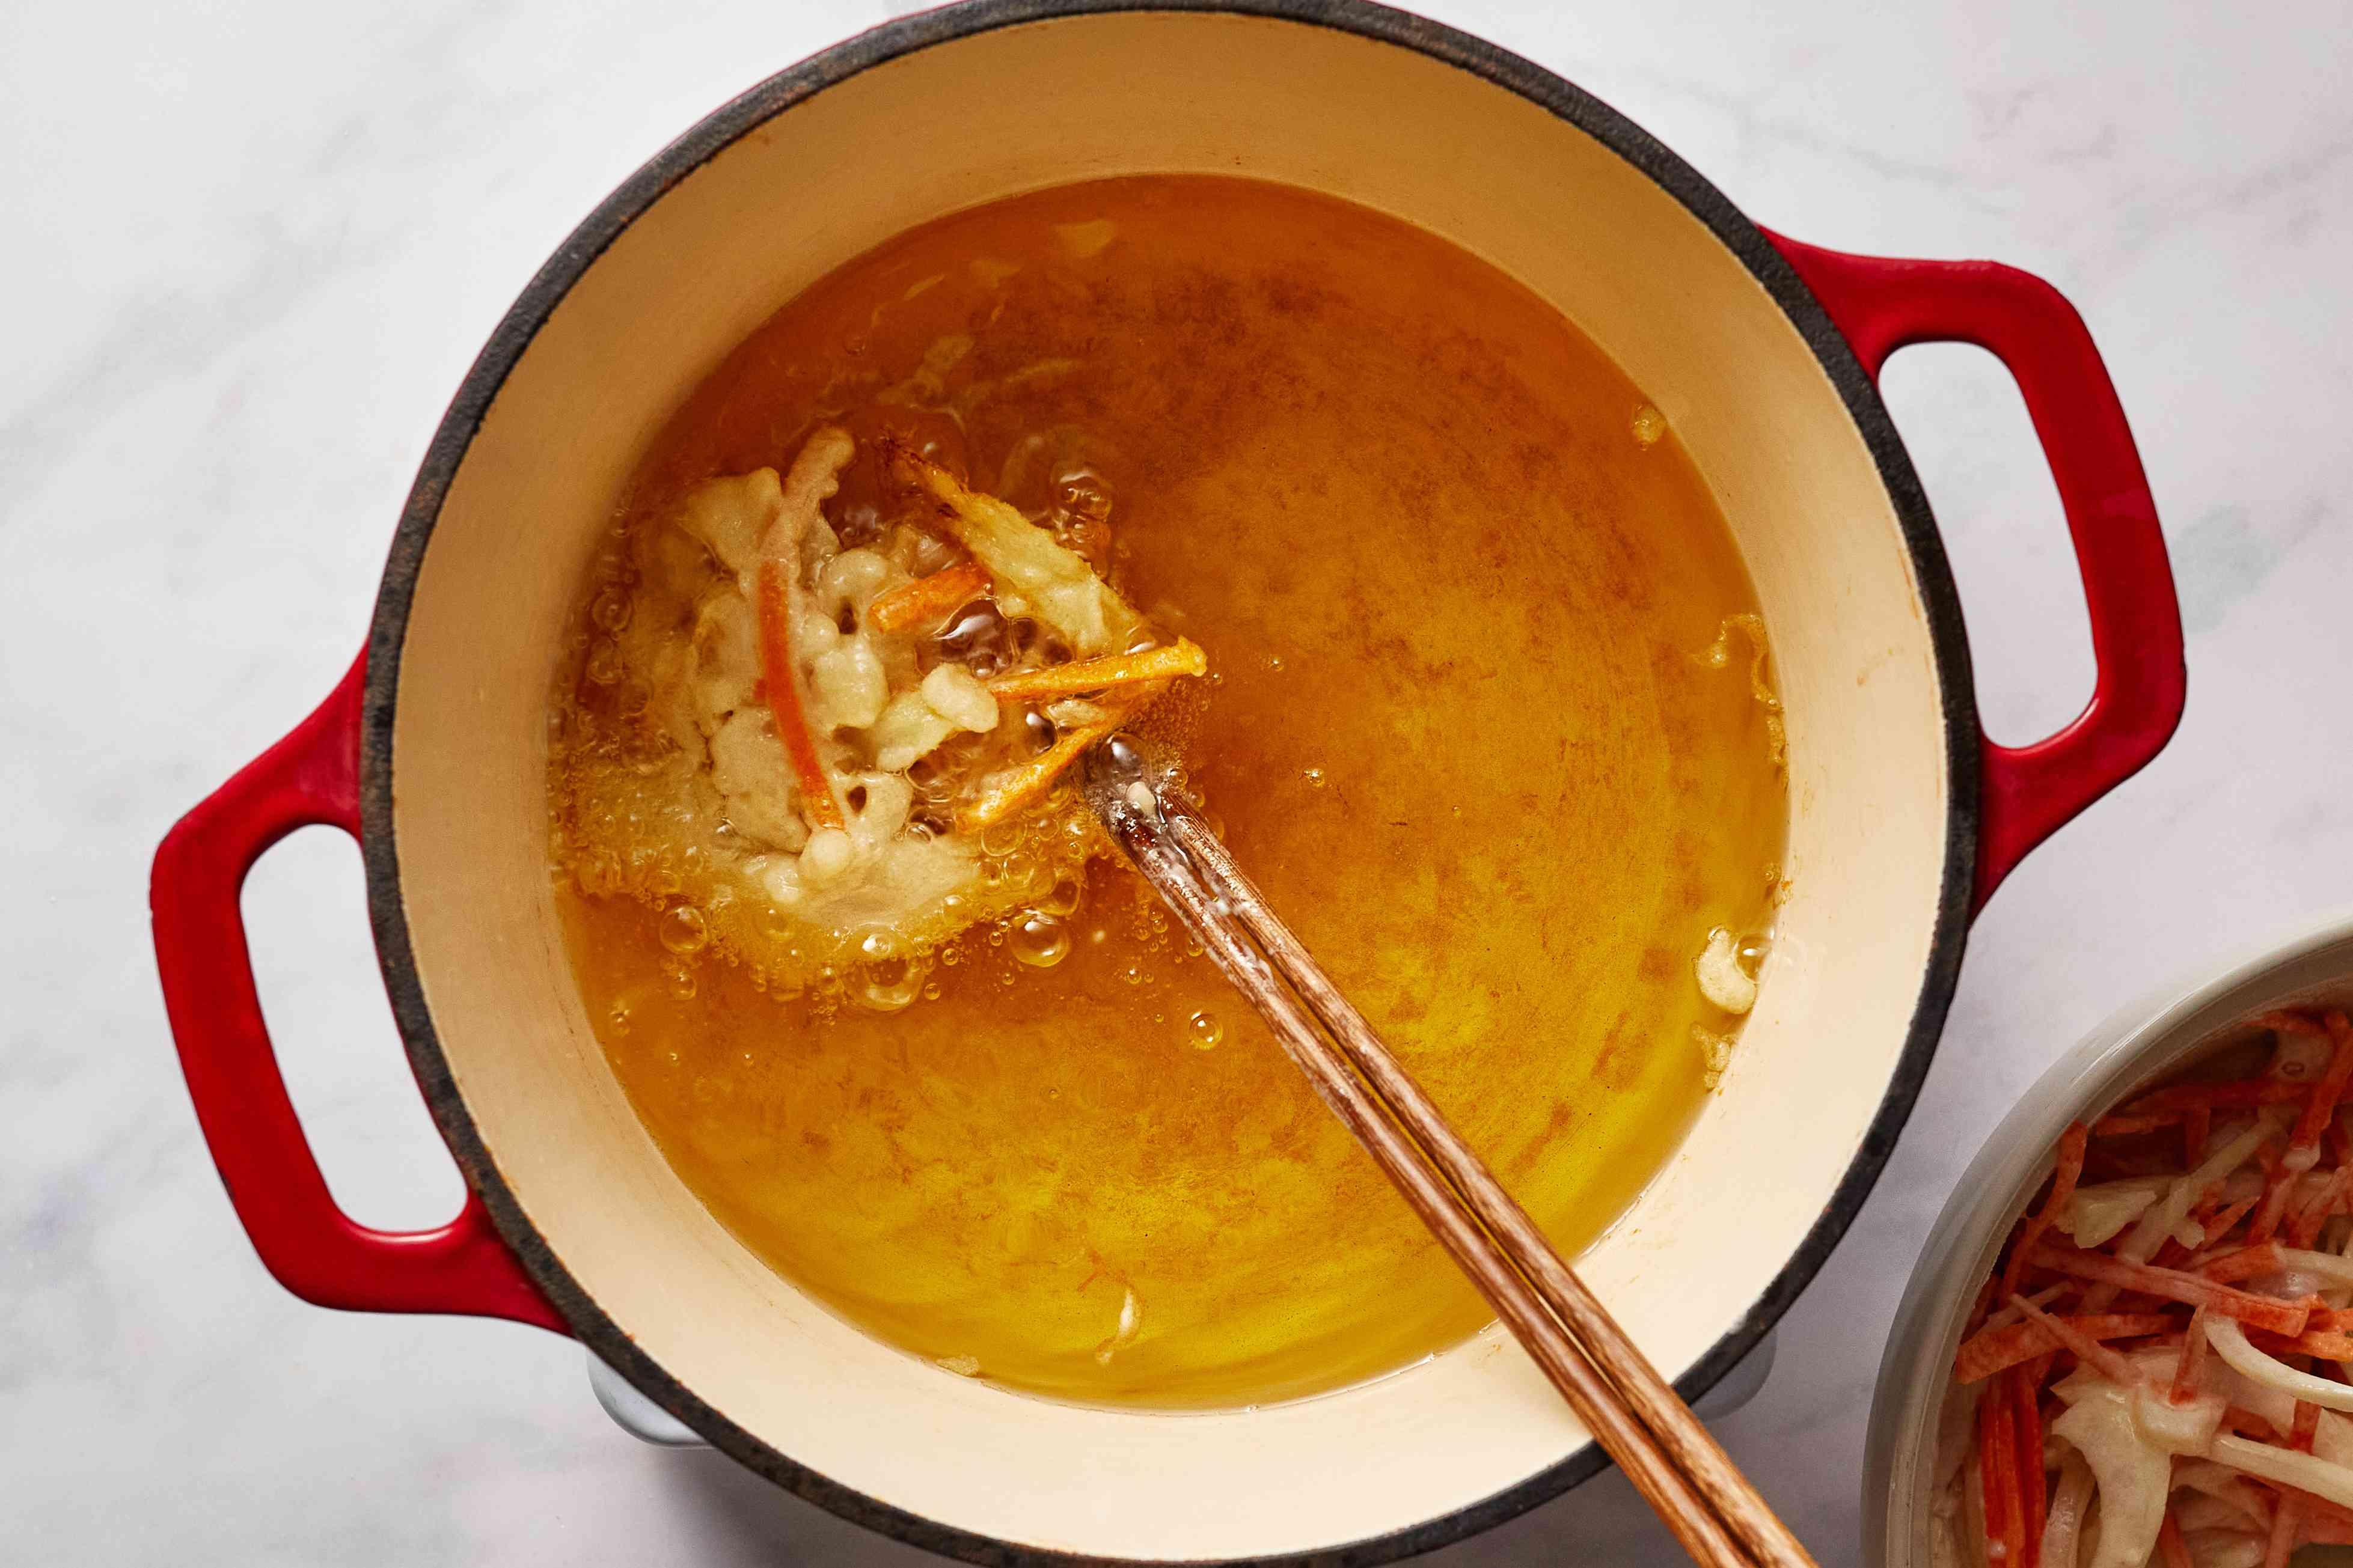 Kakiage Tempura frying in a pot with oil